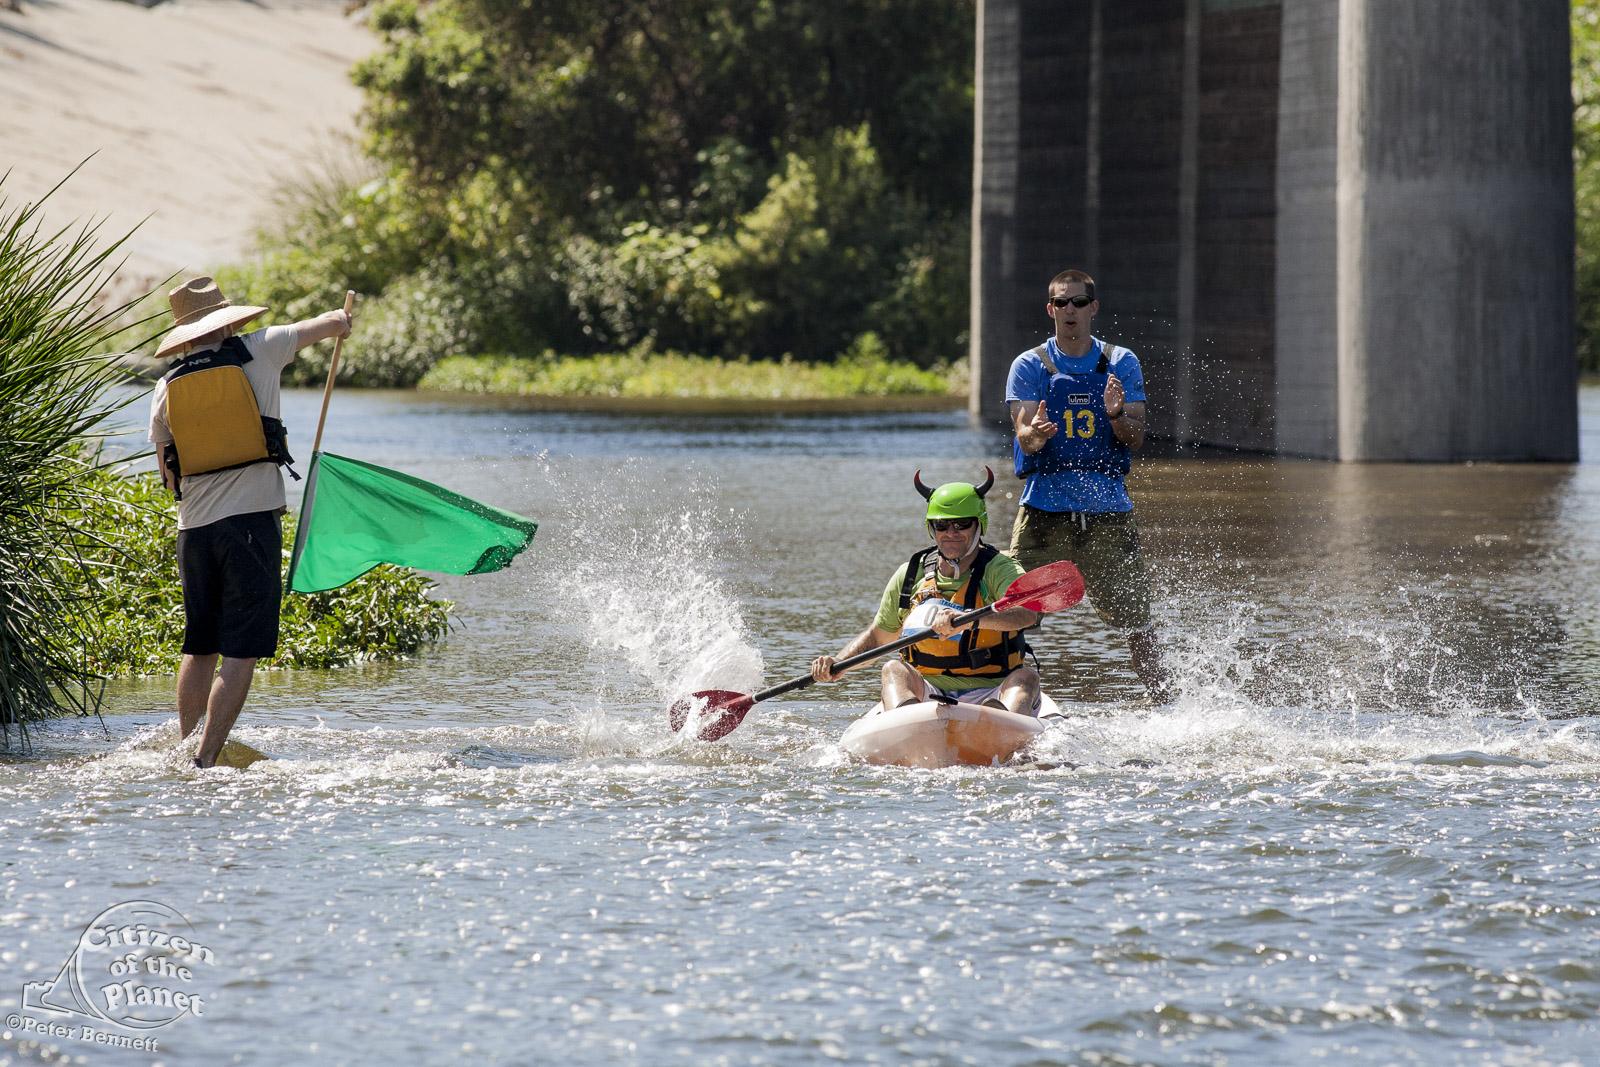 US_CA_48_3883_la_river_boat_race.jpg